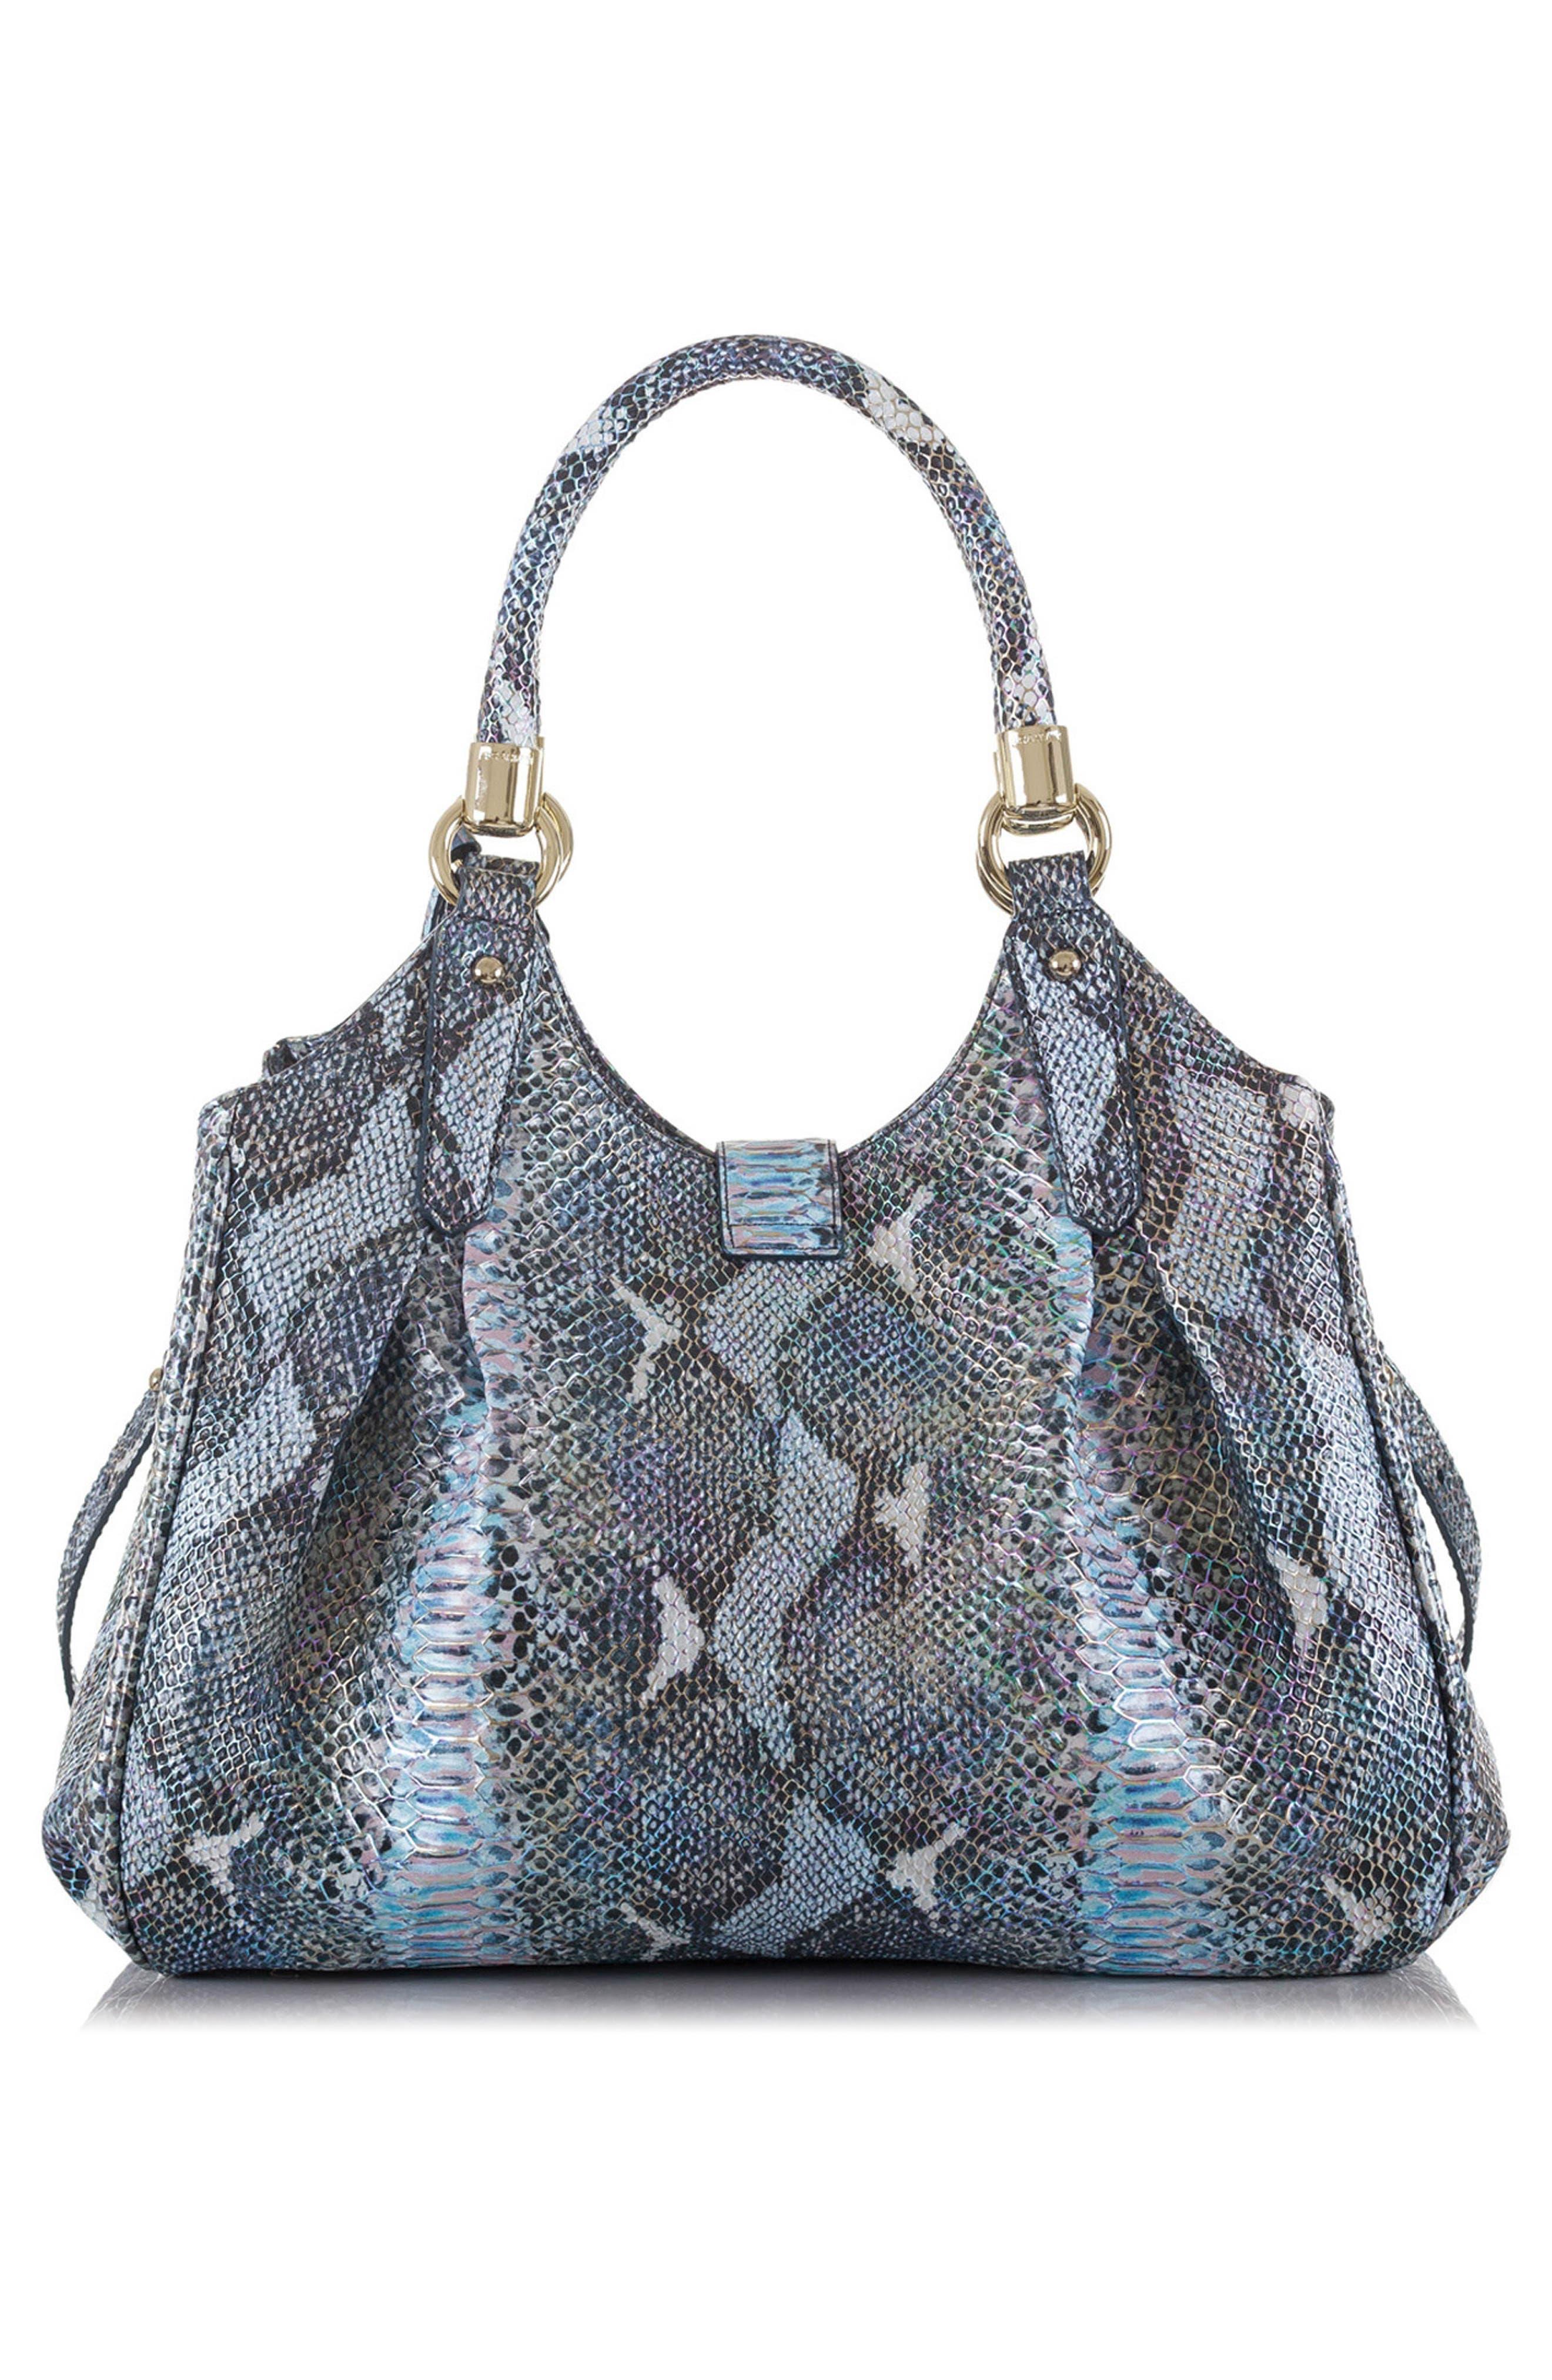 'Elisa' Leather Shopper,                             Alternate thumbnail 2, color,                             Marine Seville